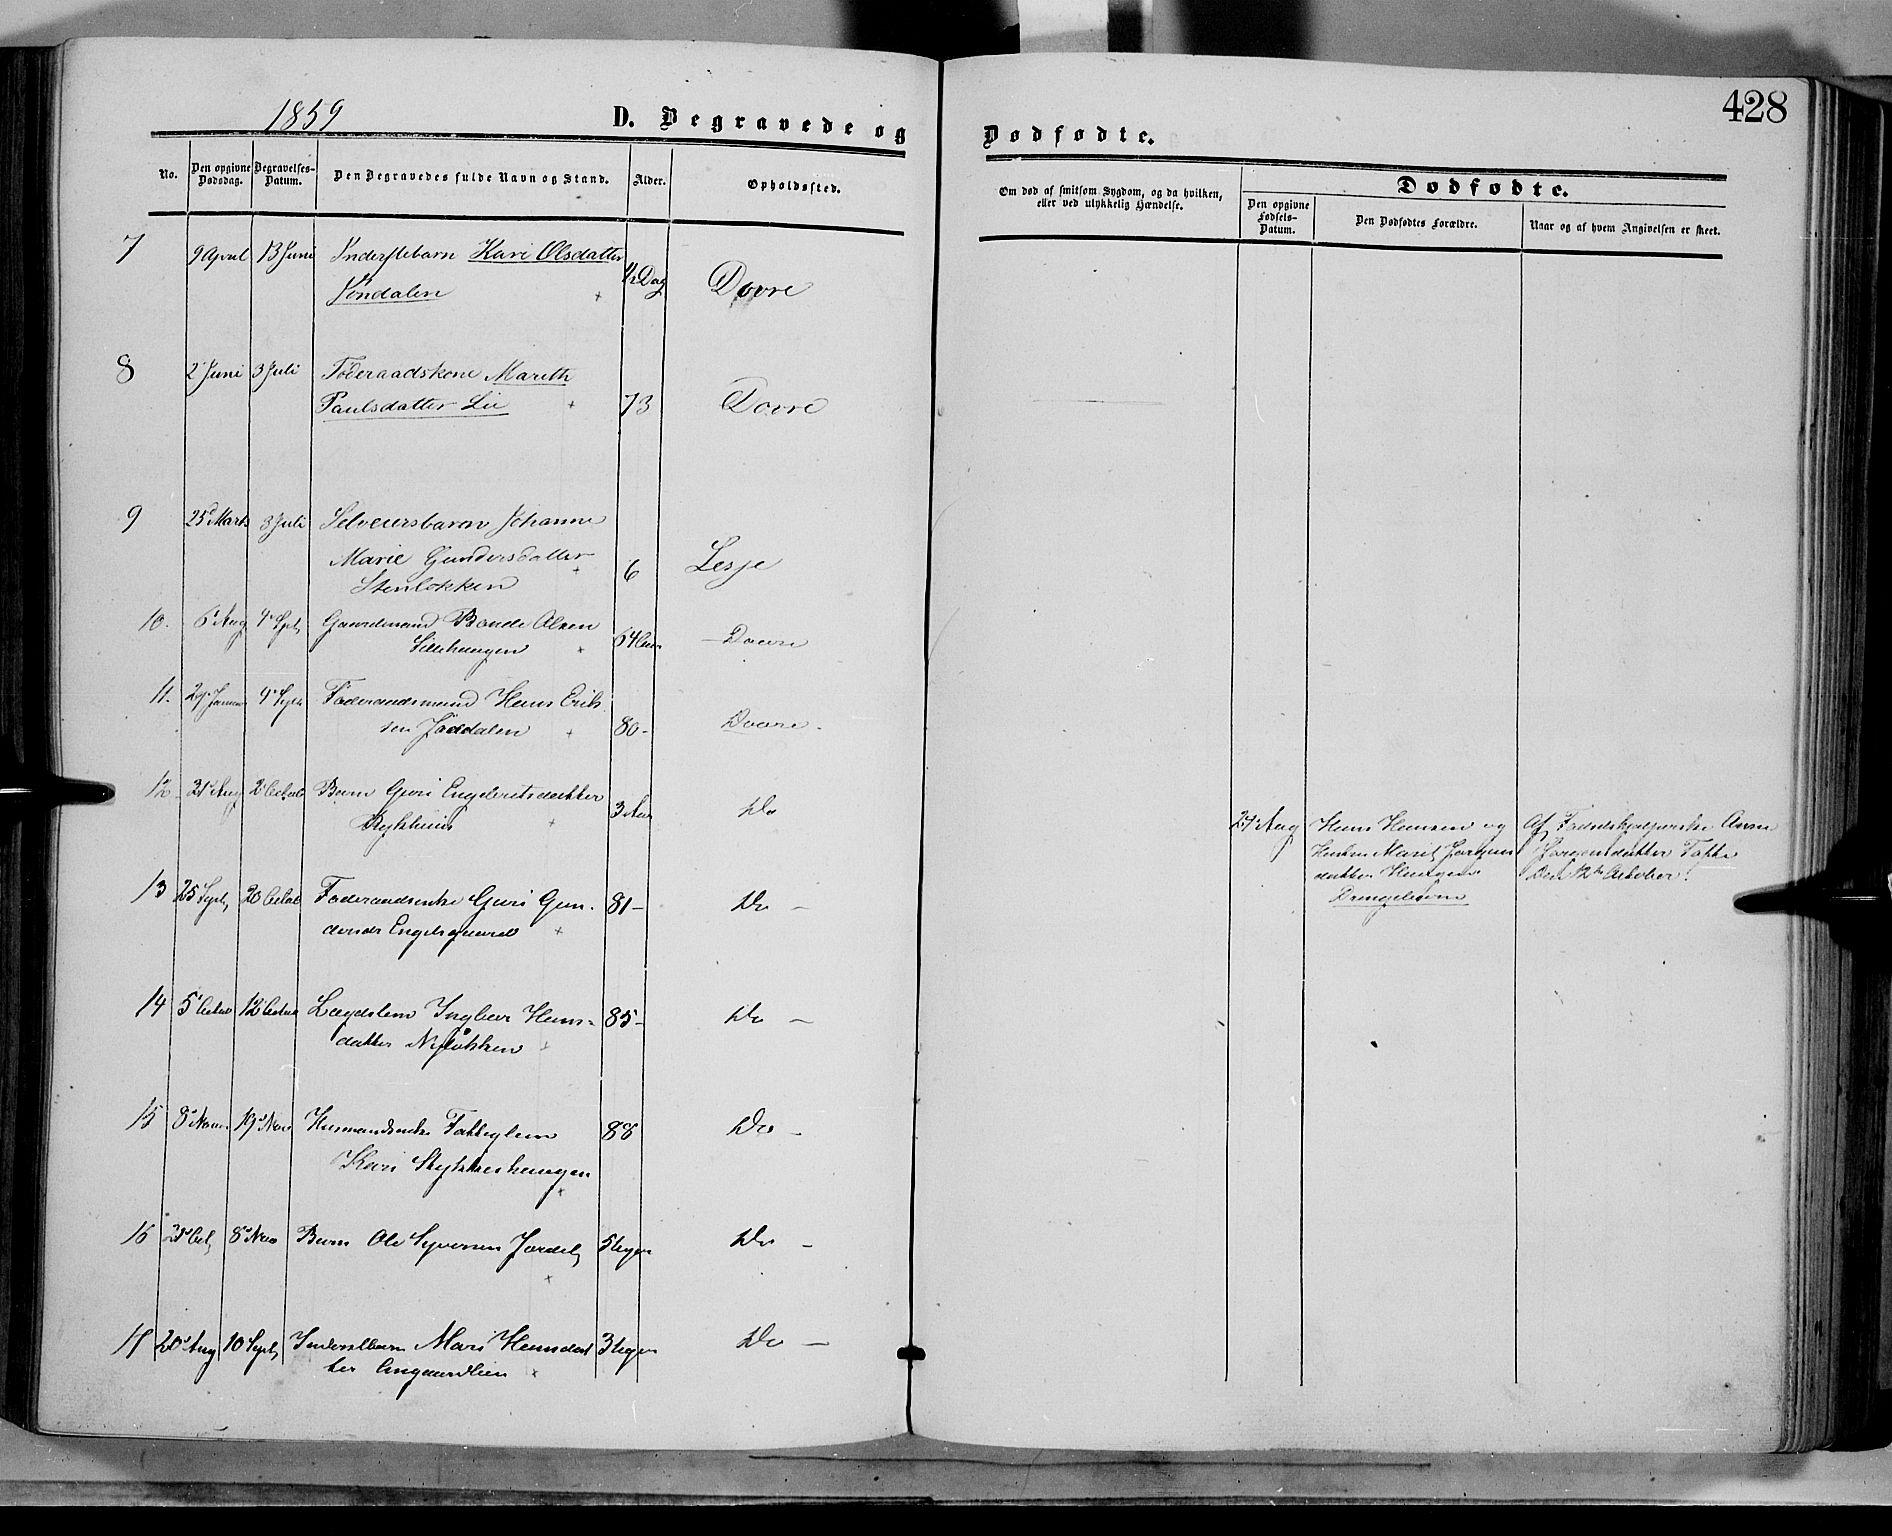 SAH, Dovre prestekontor, Ministerialbok nr. 1, 1854-1878, s. 428